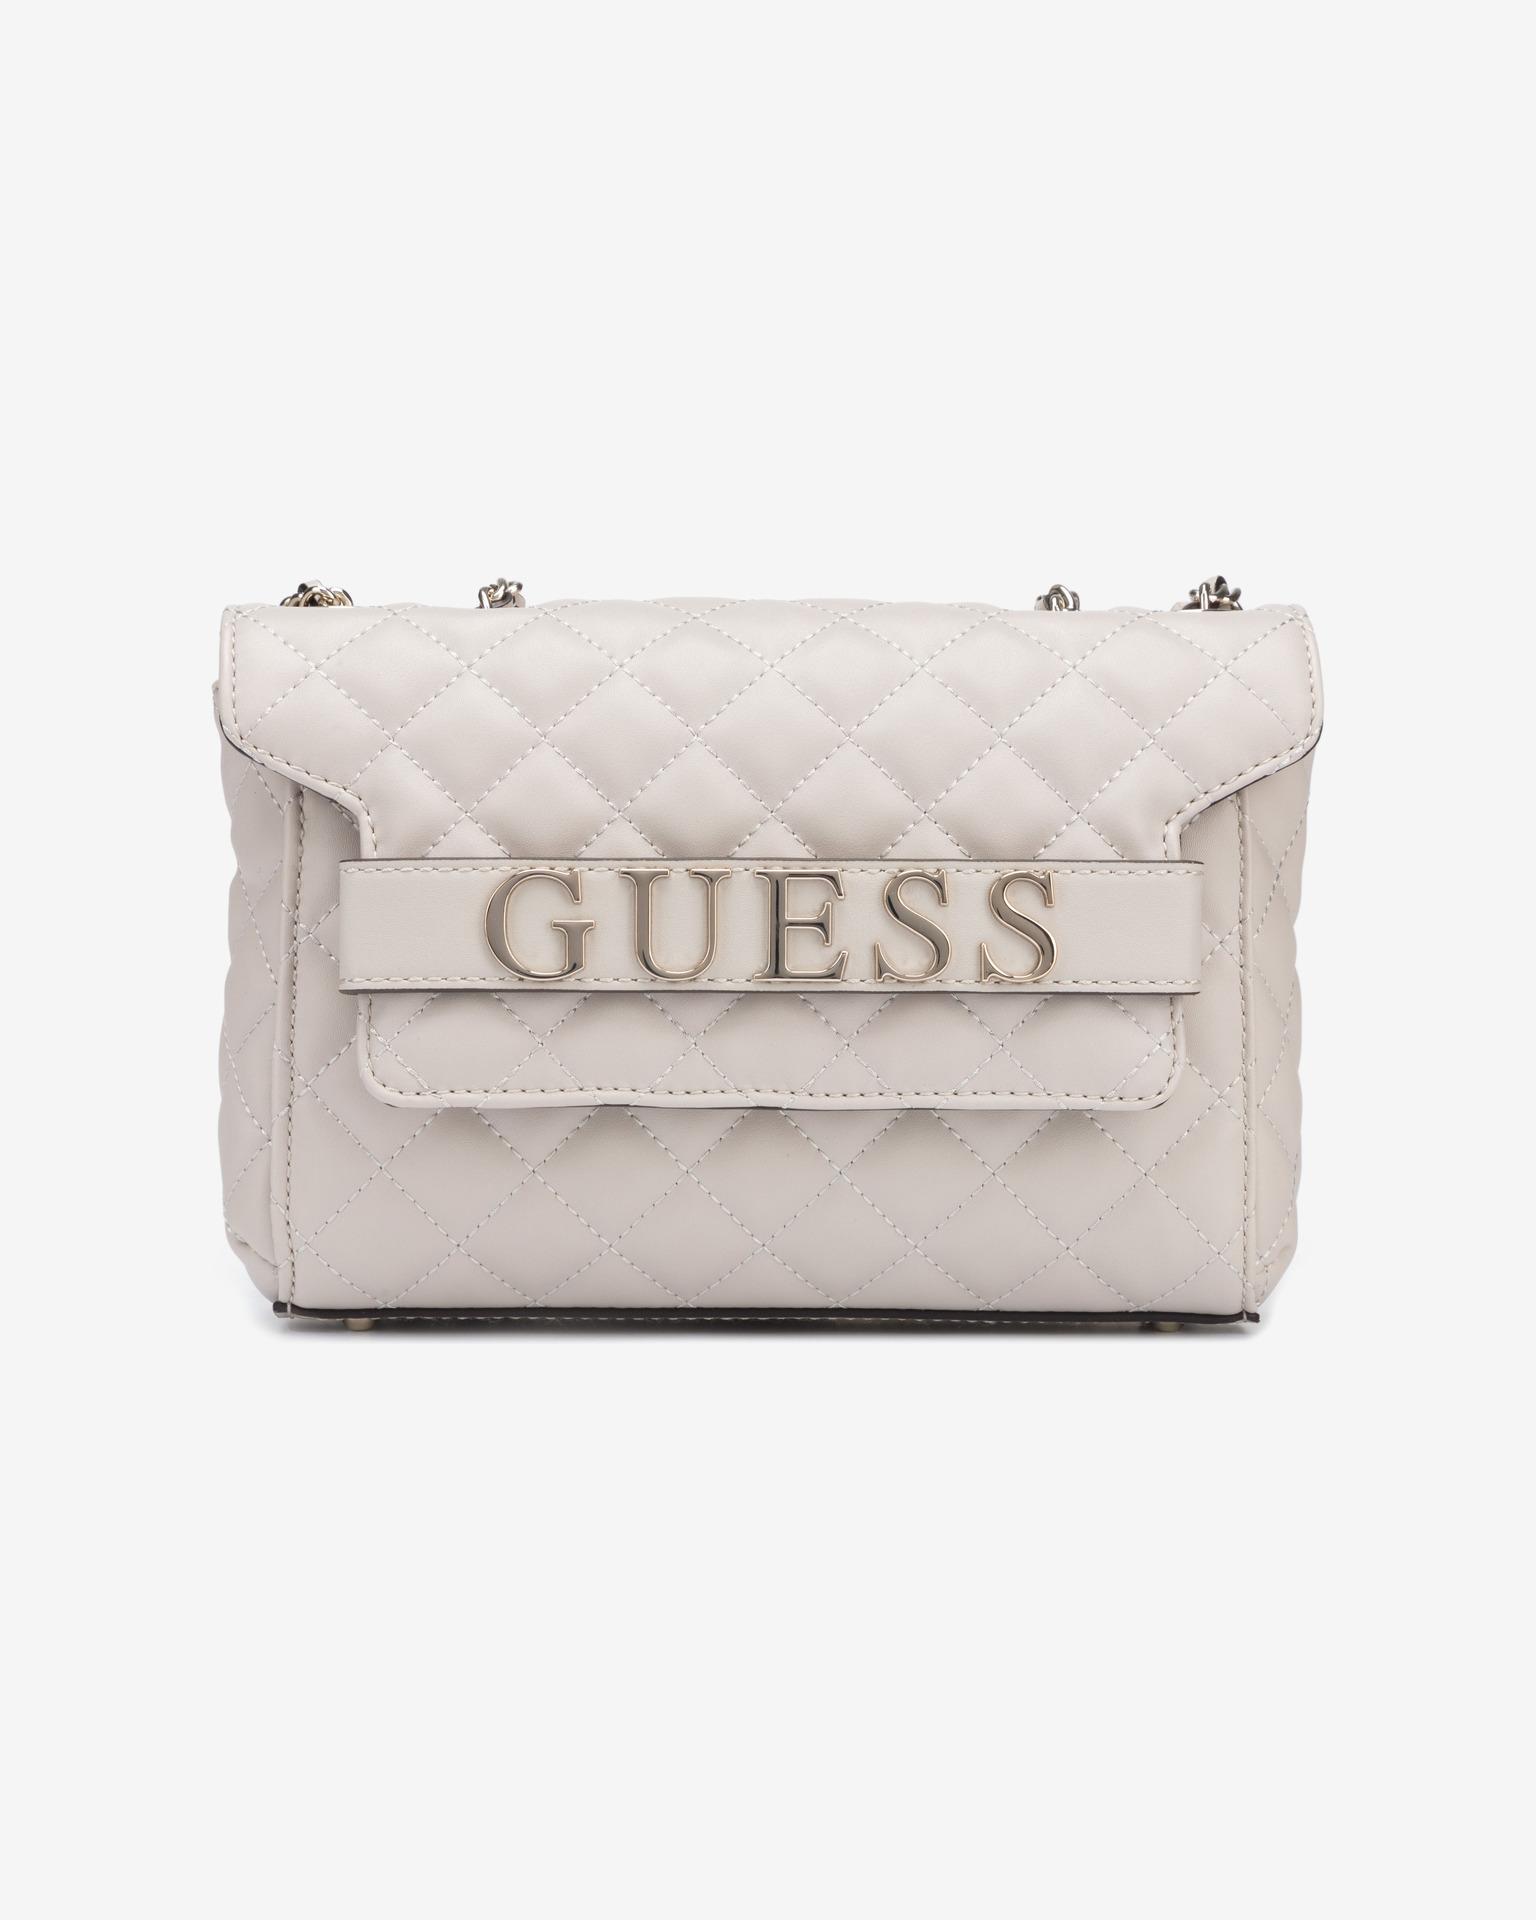 Guess grey crossbody handbag Illy Convertibe